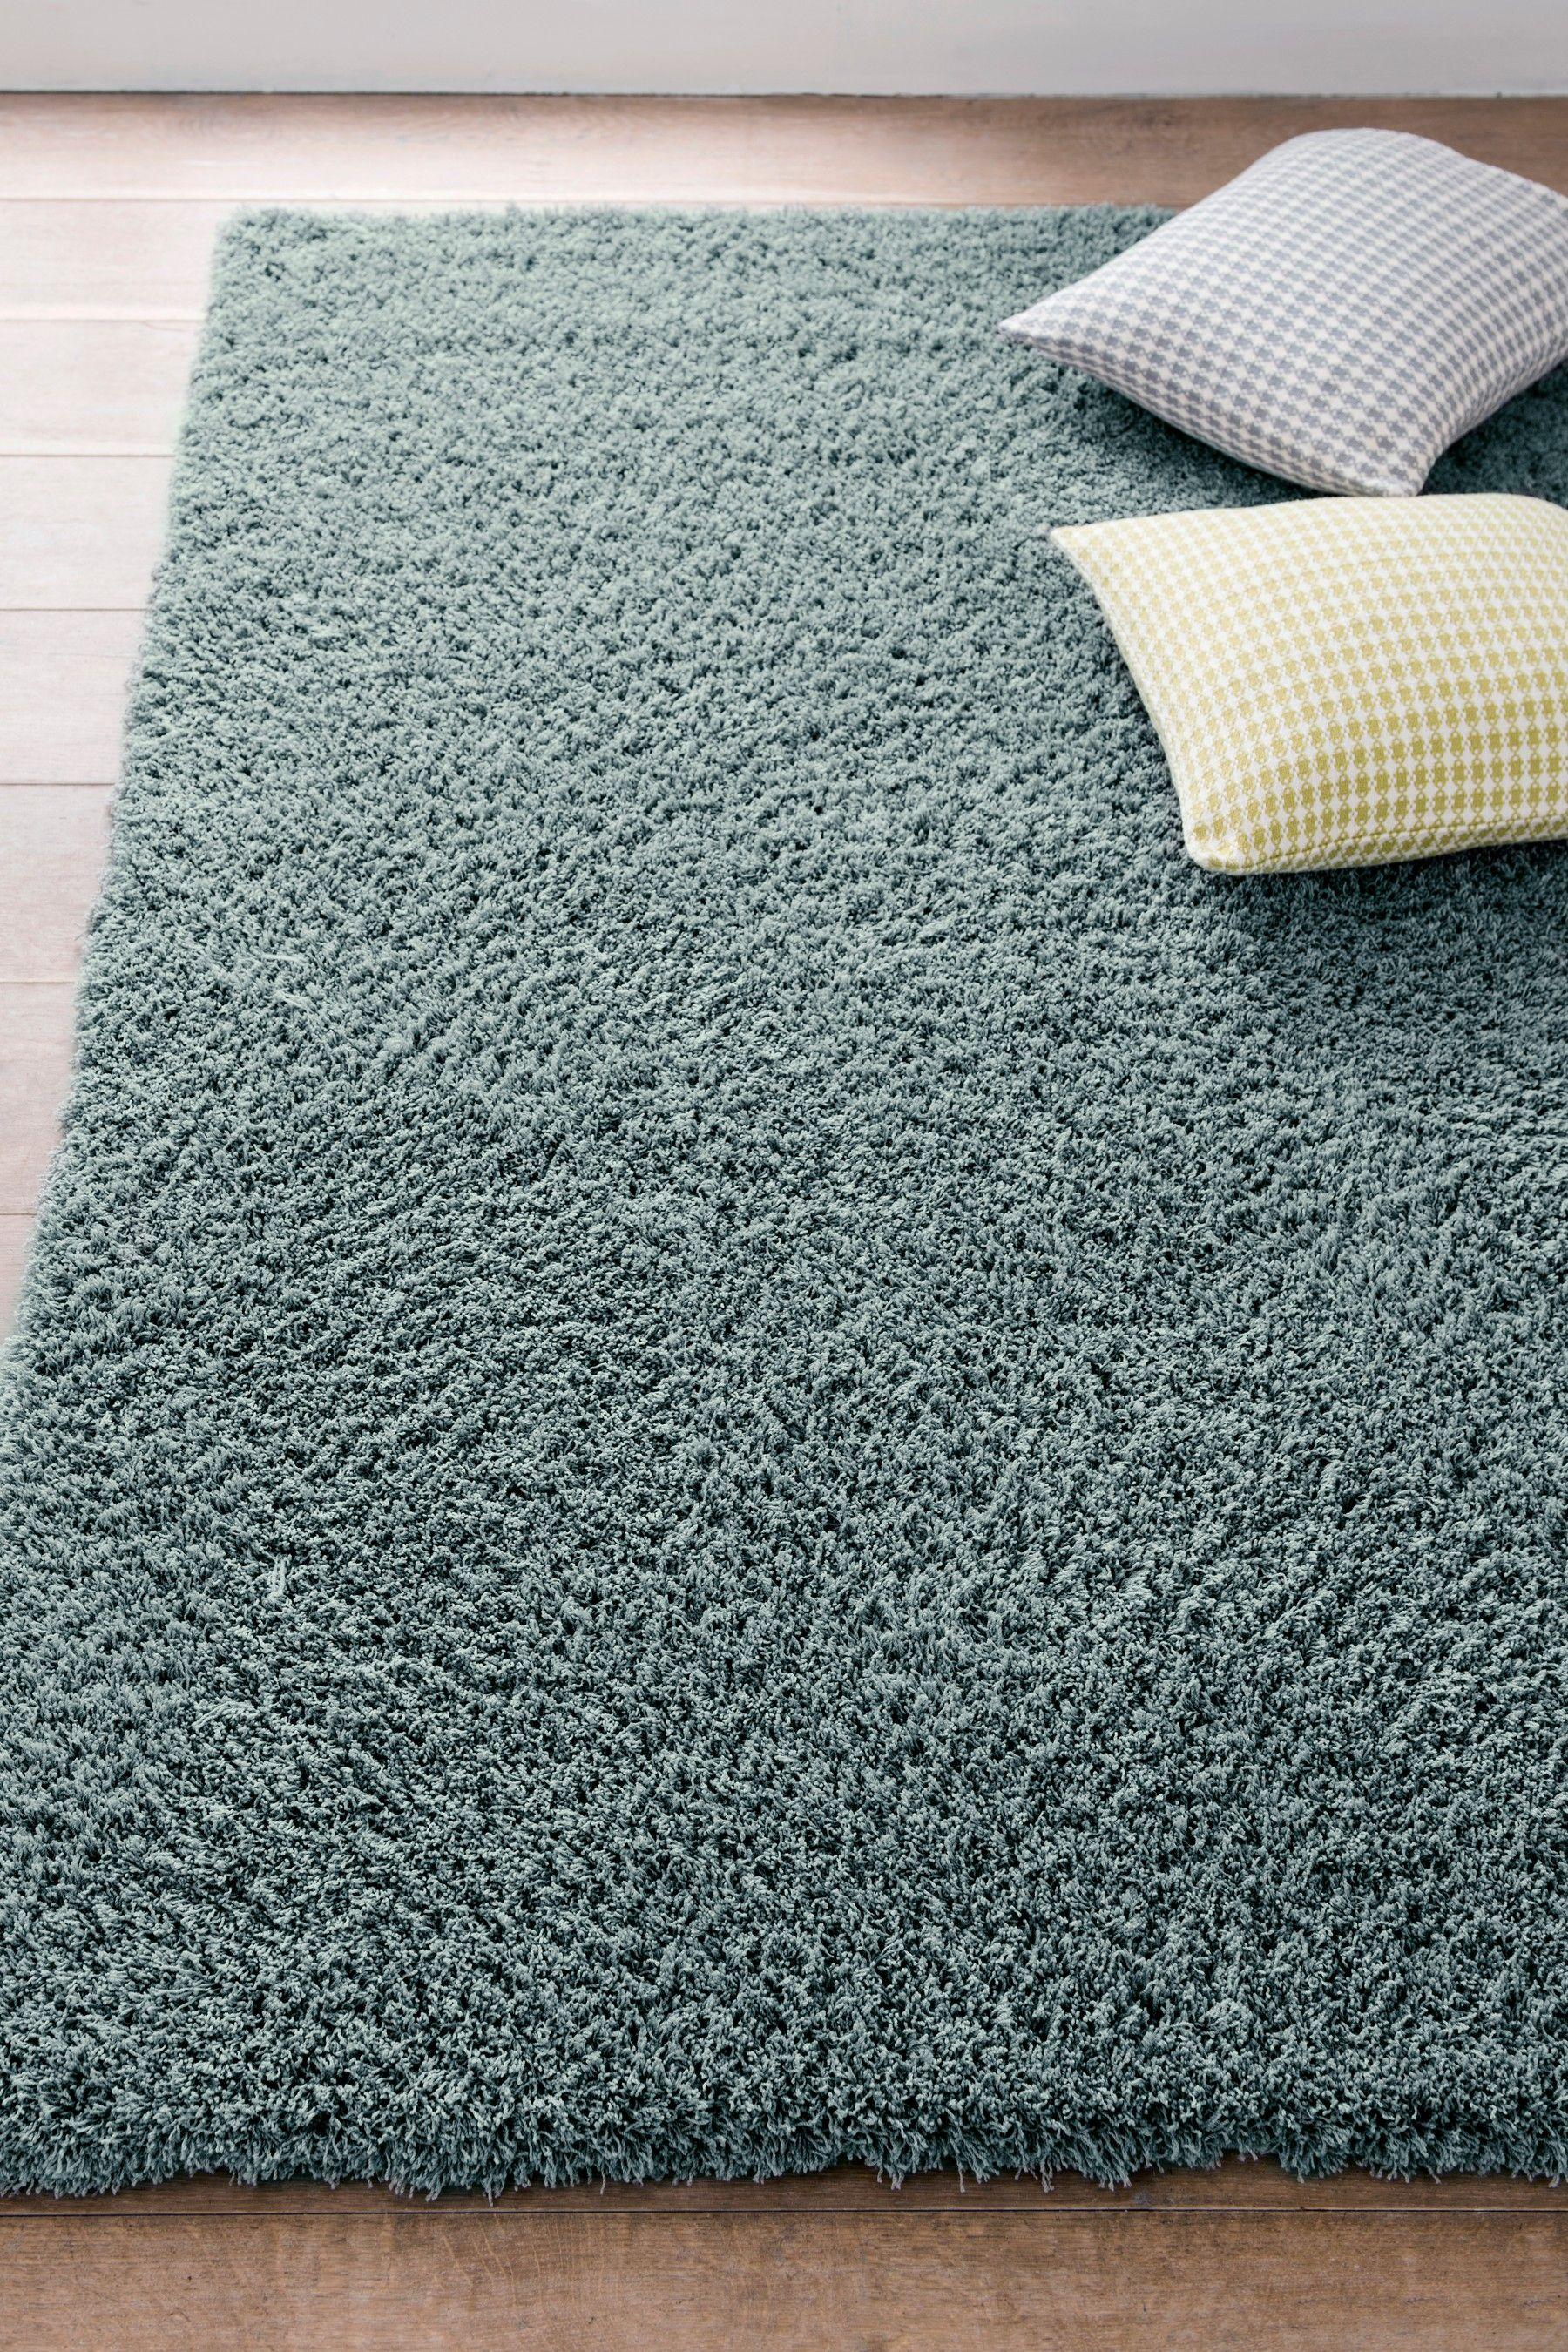 Pin By Ann Waters On Marks Bedroom Large Wool Rugs Rugs Modern Rugs